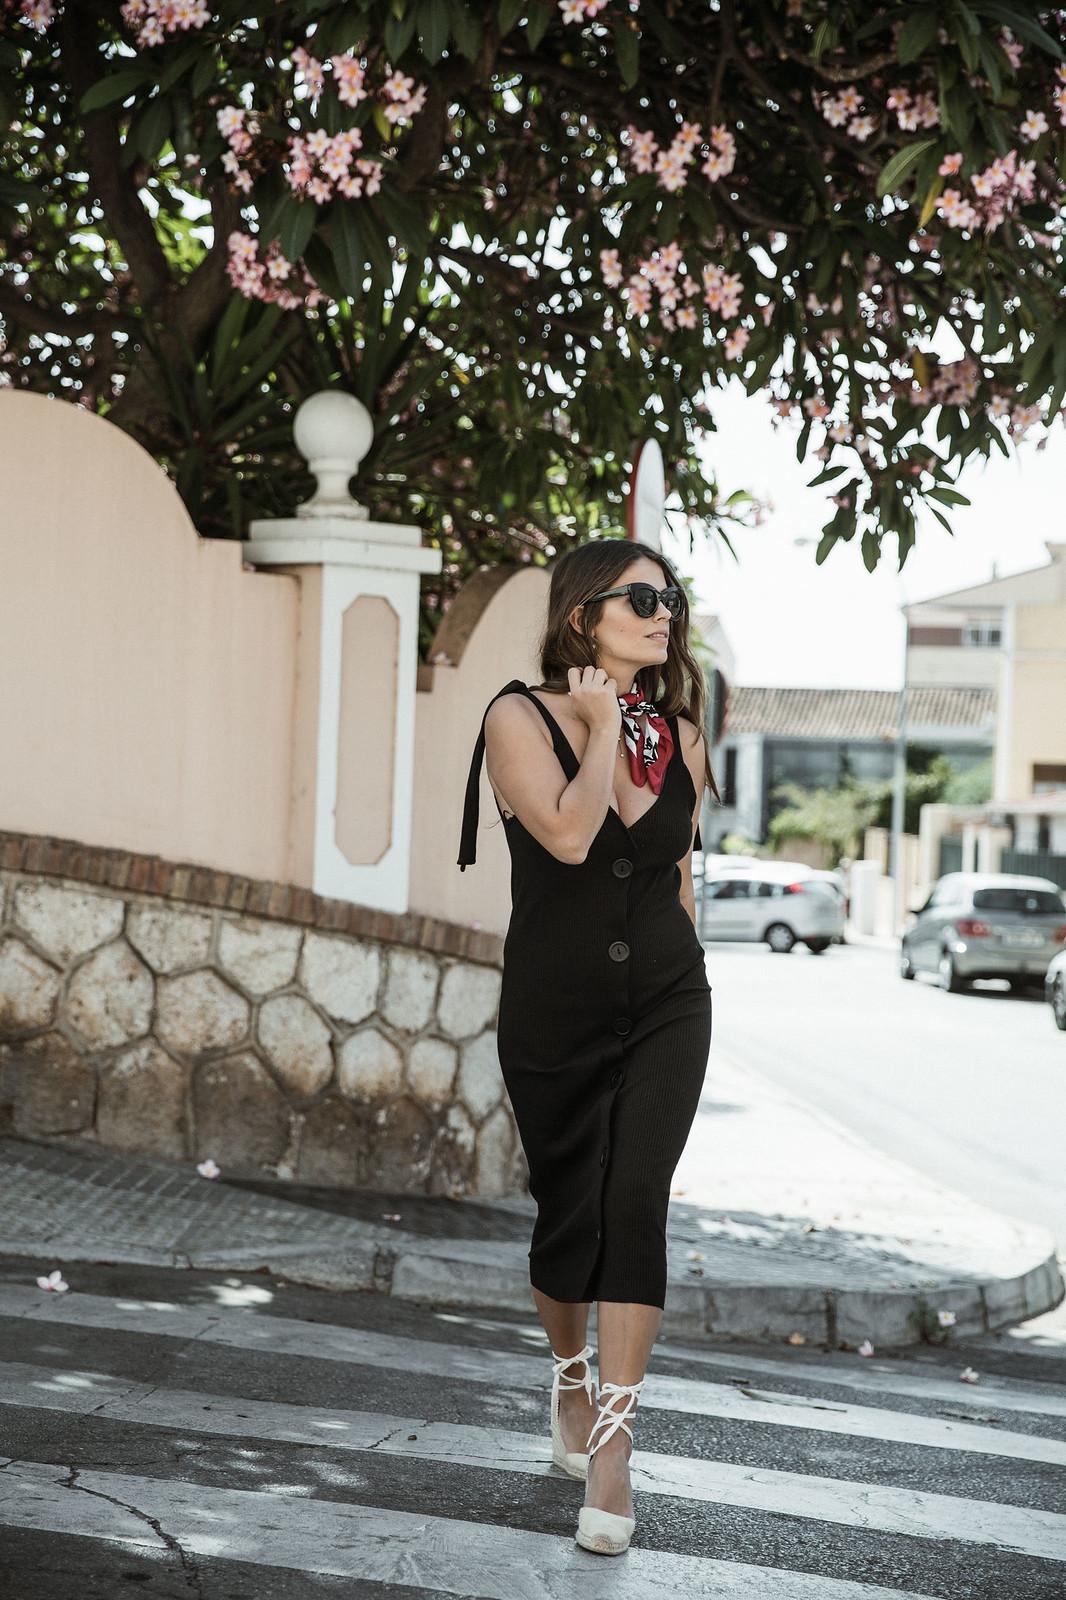 seams for a desire - jessie chanes - black tight dress - zara-11